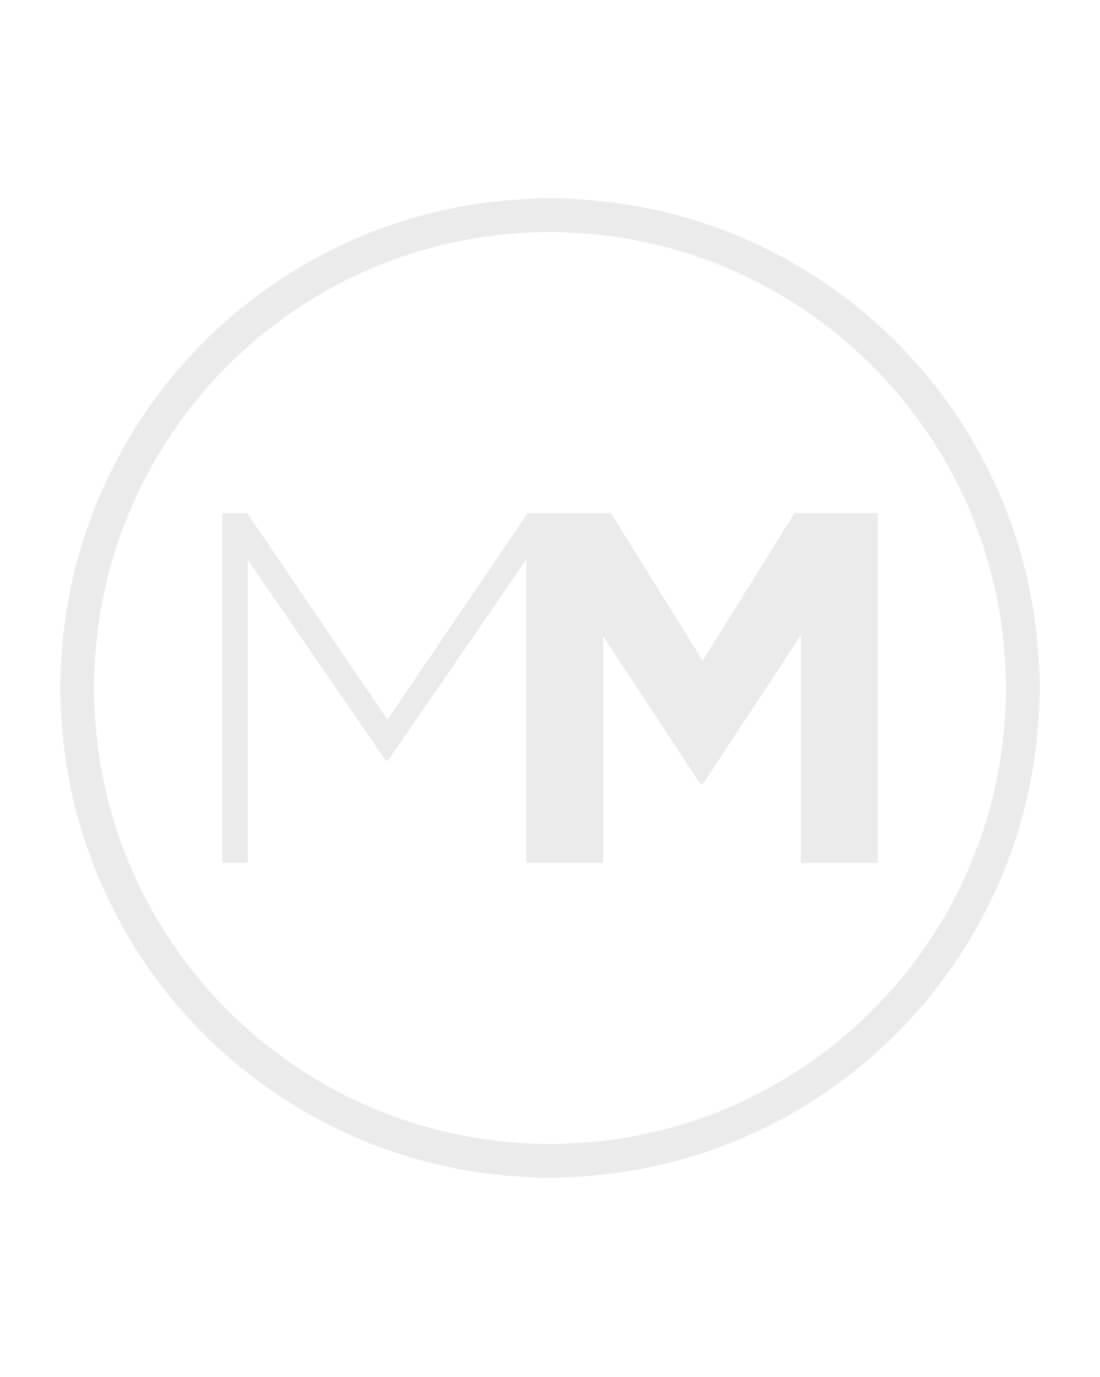 Claudia Strater 1406045 jurk zwart wit